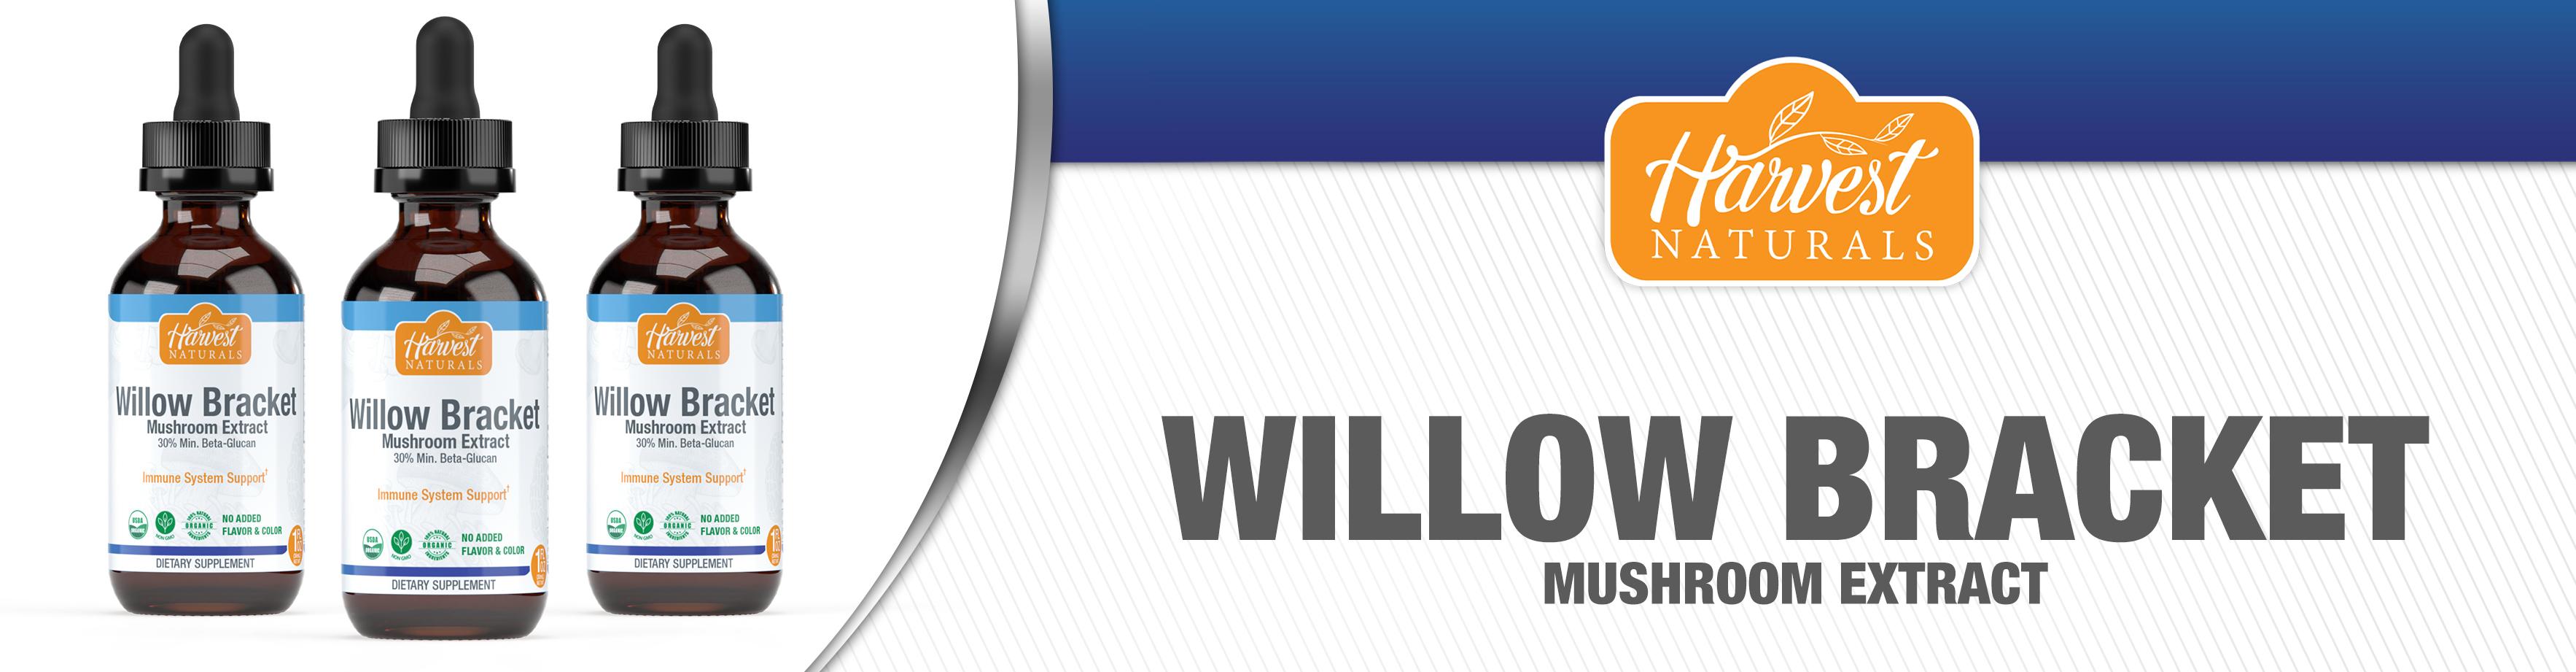 willow-bracket-mushroom-1-fl-oz-10-21.jpg